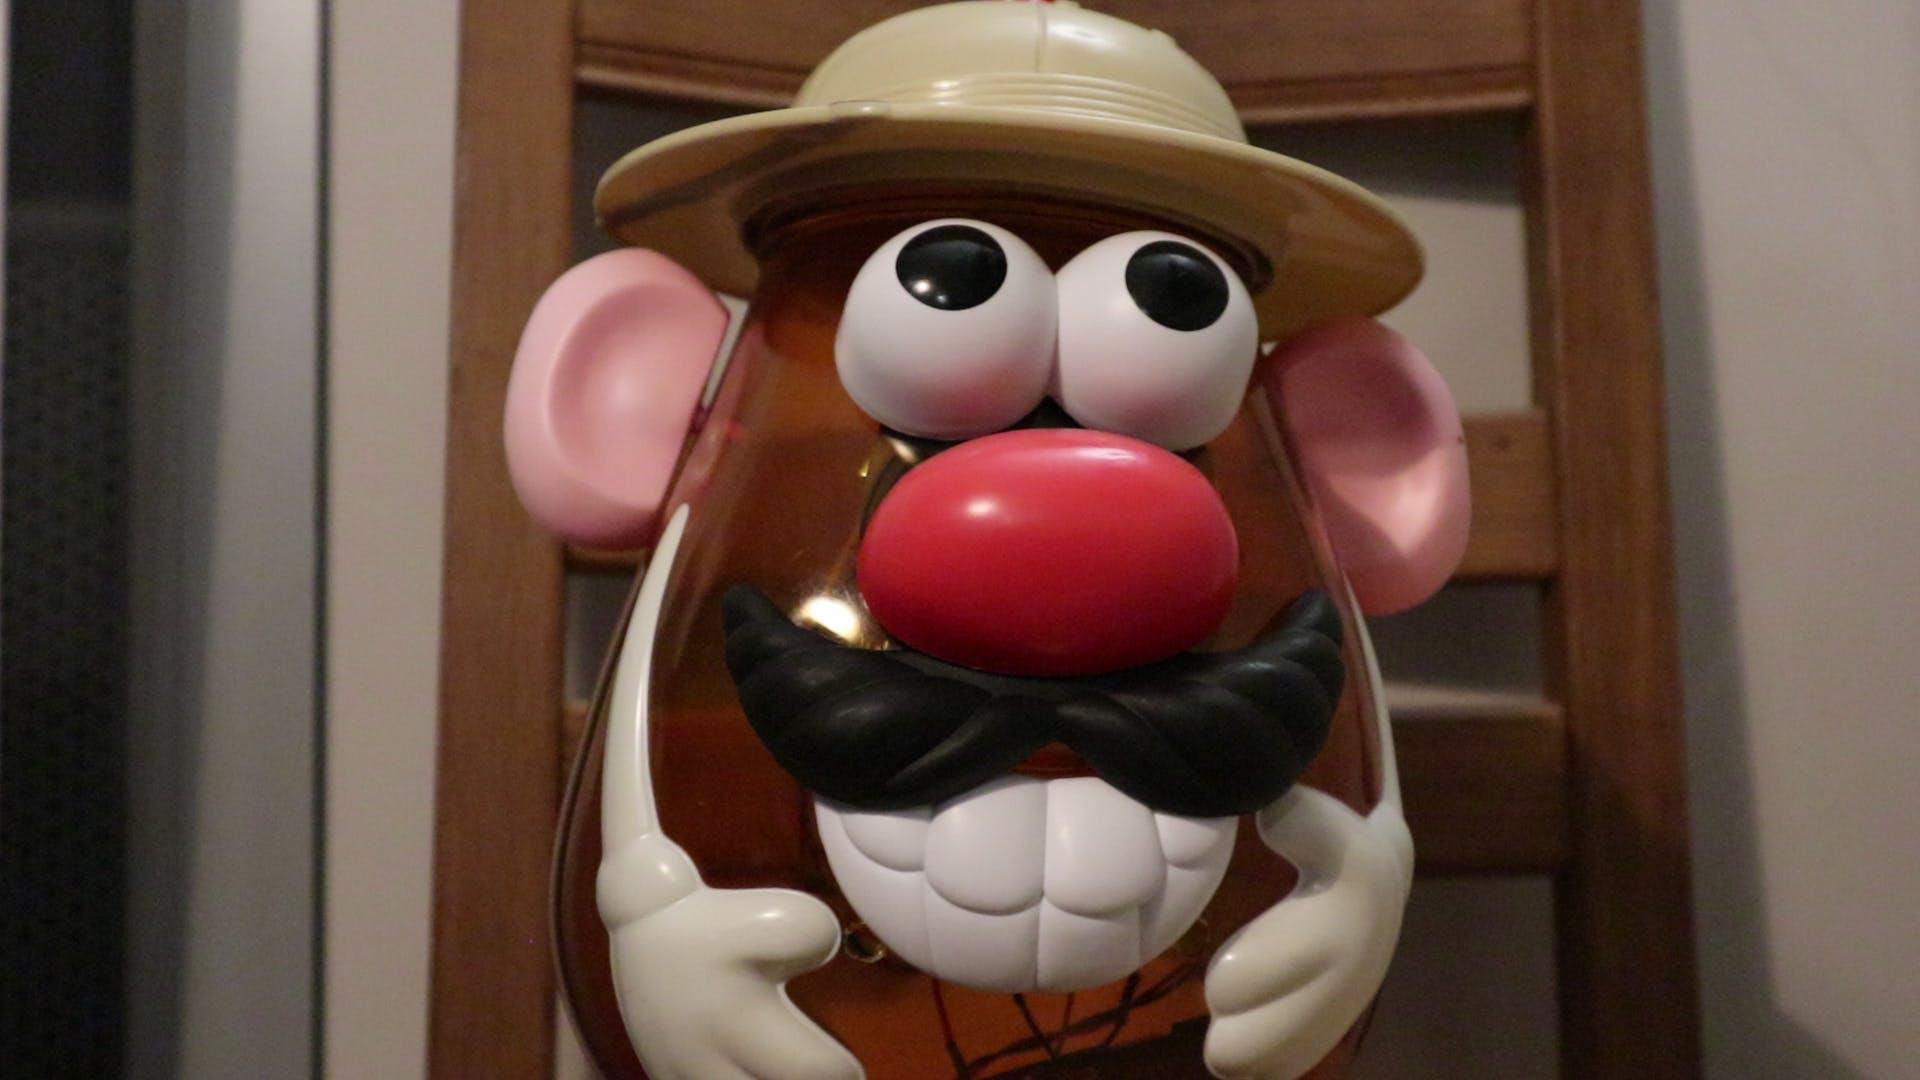 The Mr. Potato Head toy